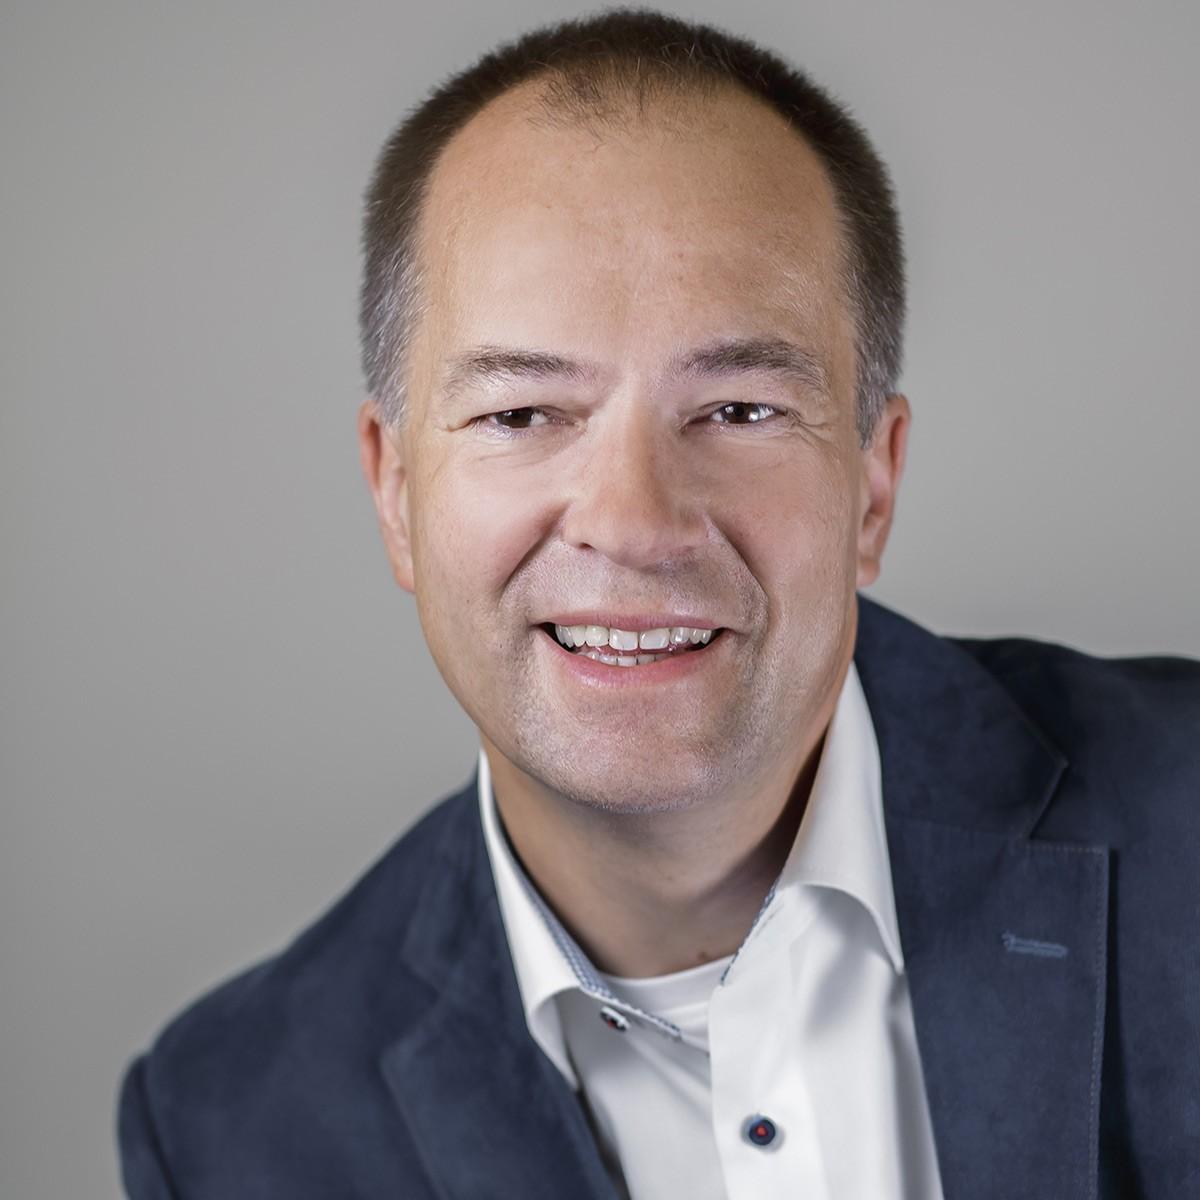 Axel Püttner